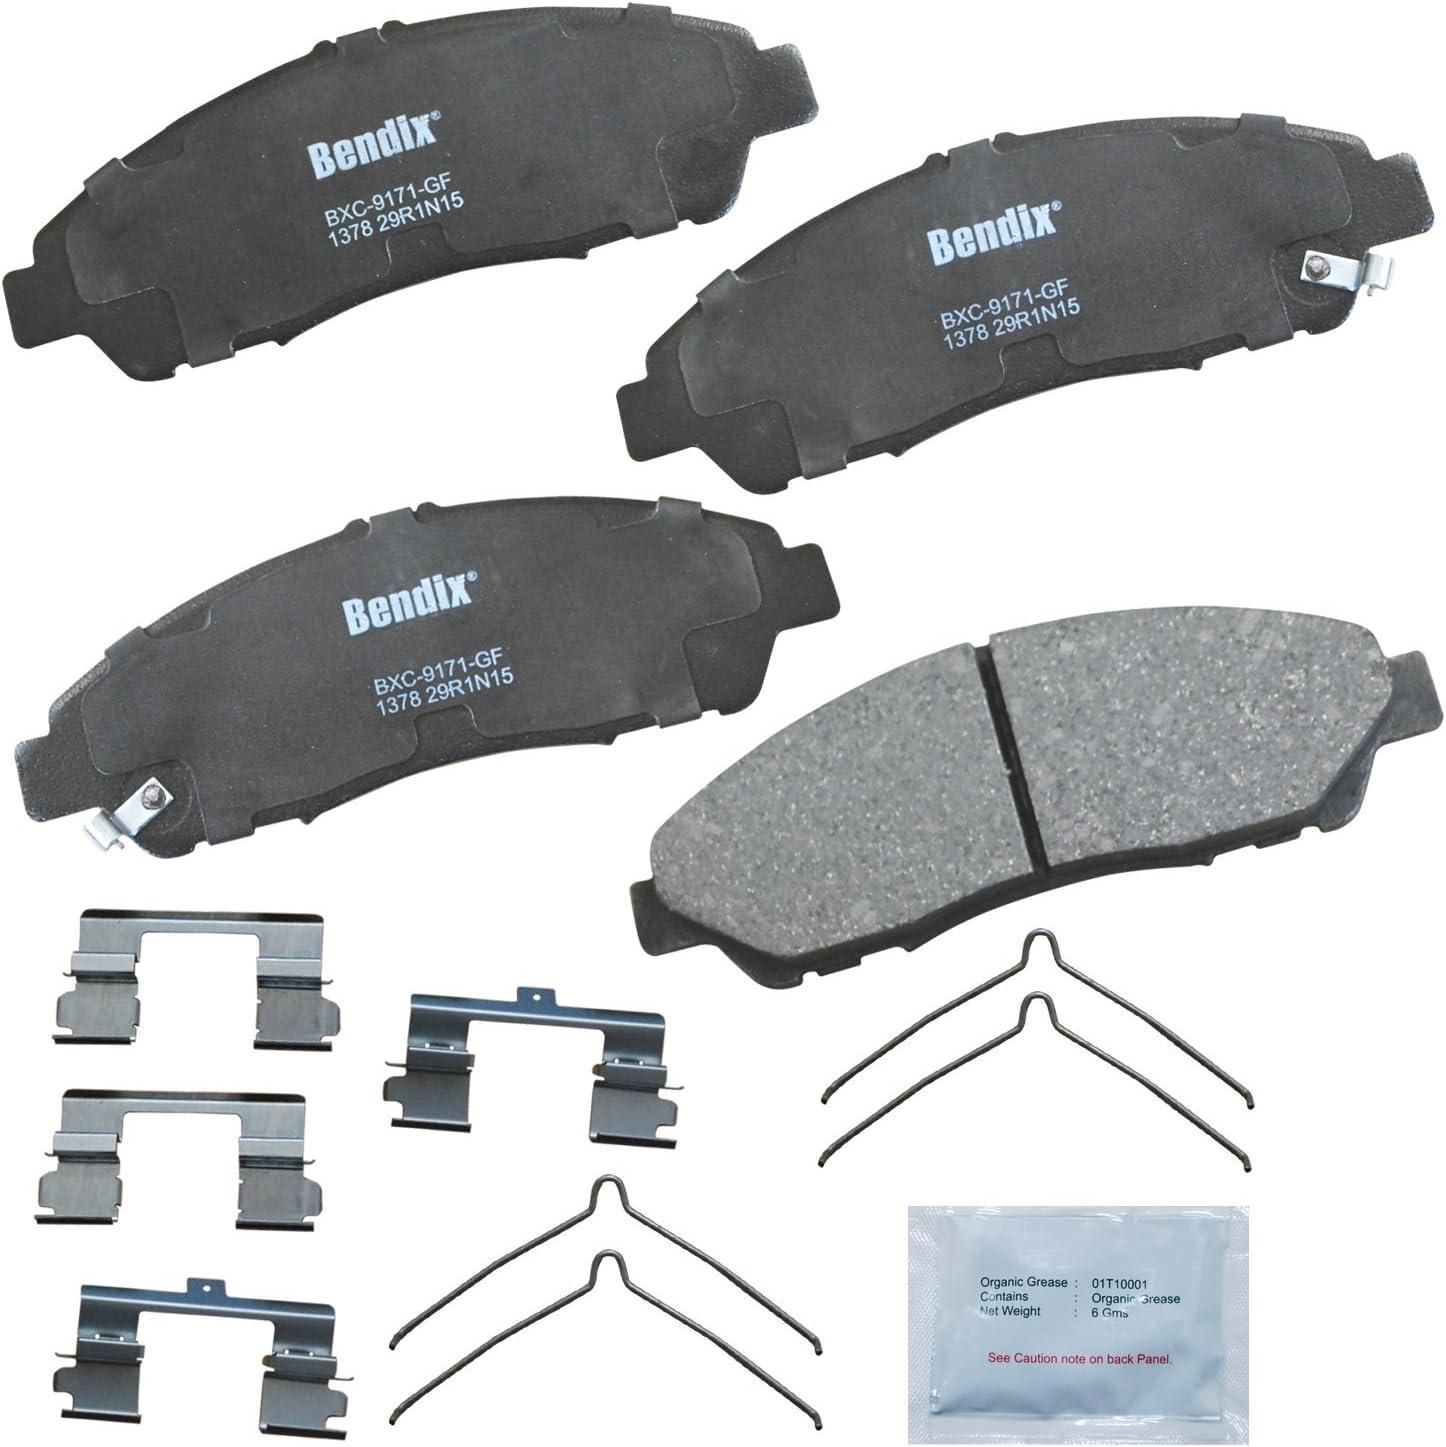 Bendix Premium Copper Free CFC1281 Rear Disc Brake Pad Set For Acuta MDX Models